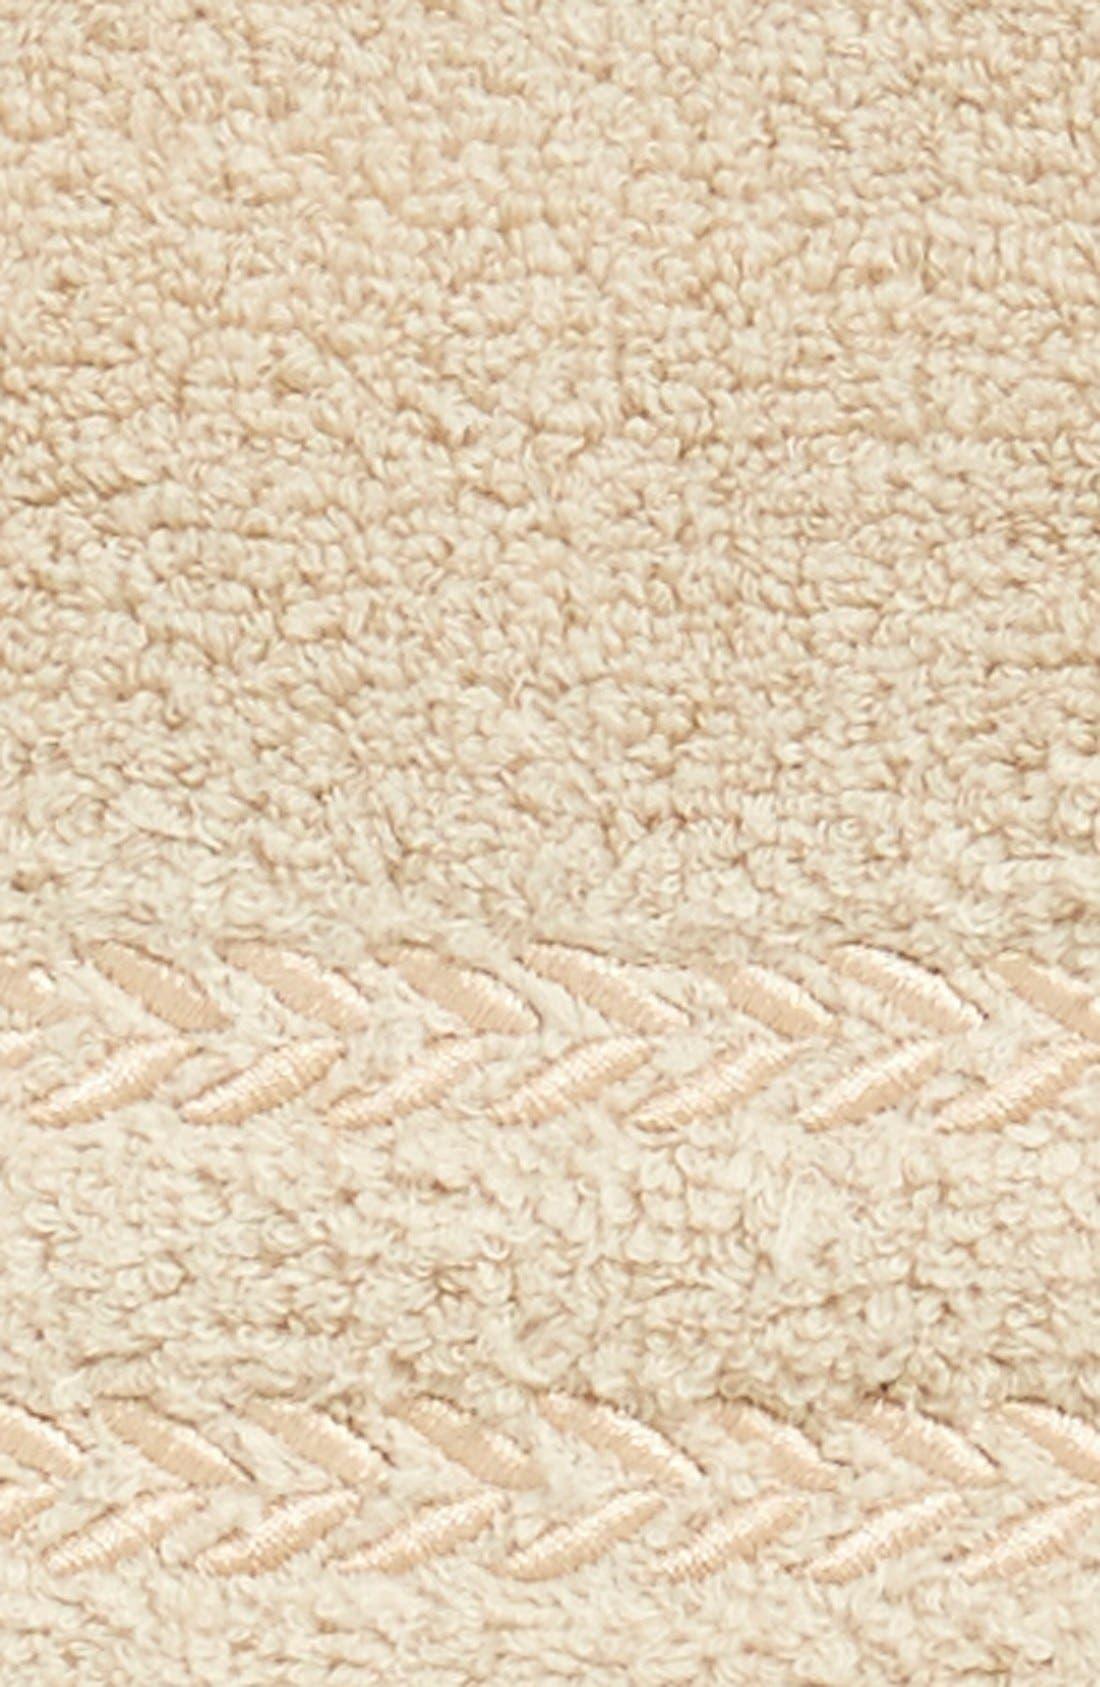 'Pearl Essence' Hand Towel,                             Alternate thumbnail 2, color,                             250